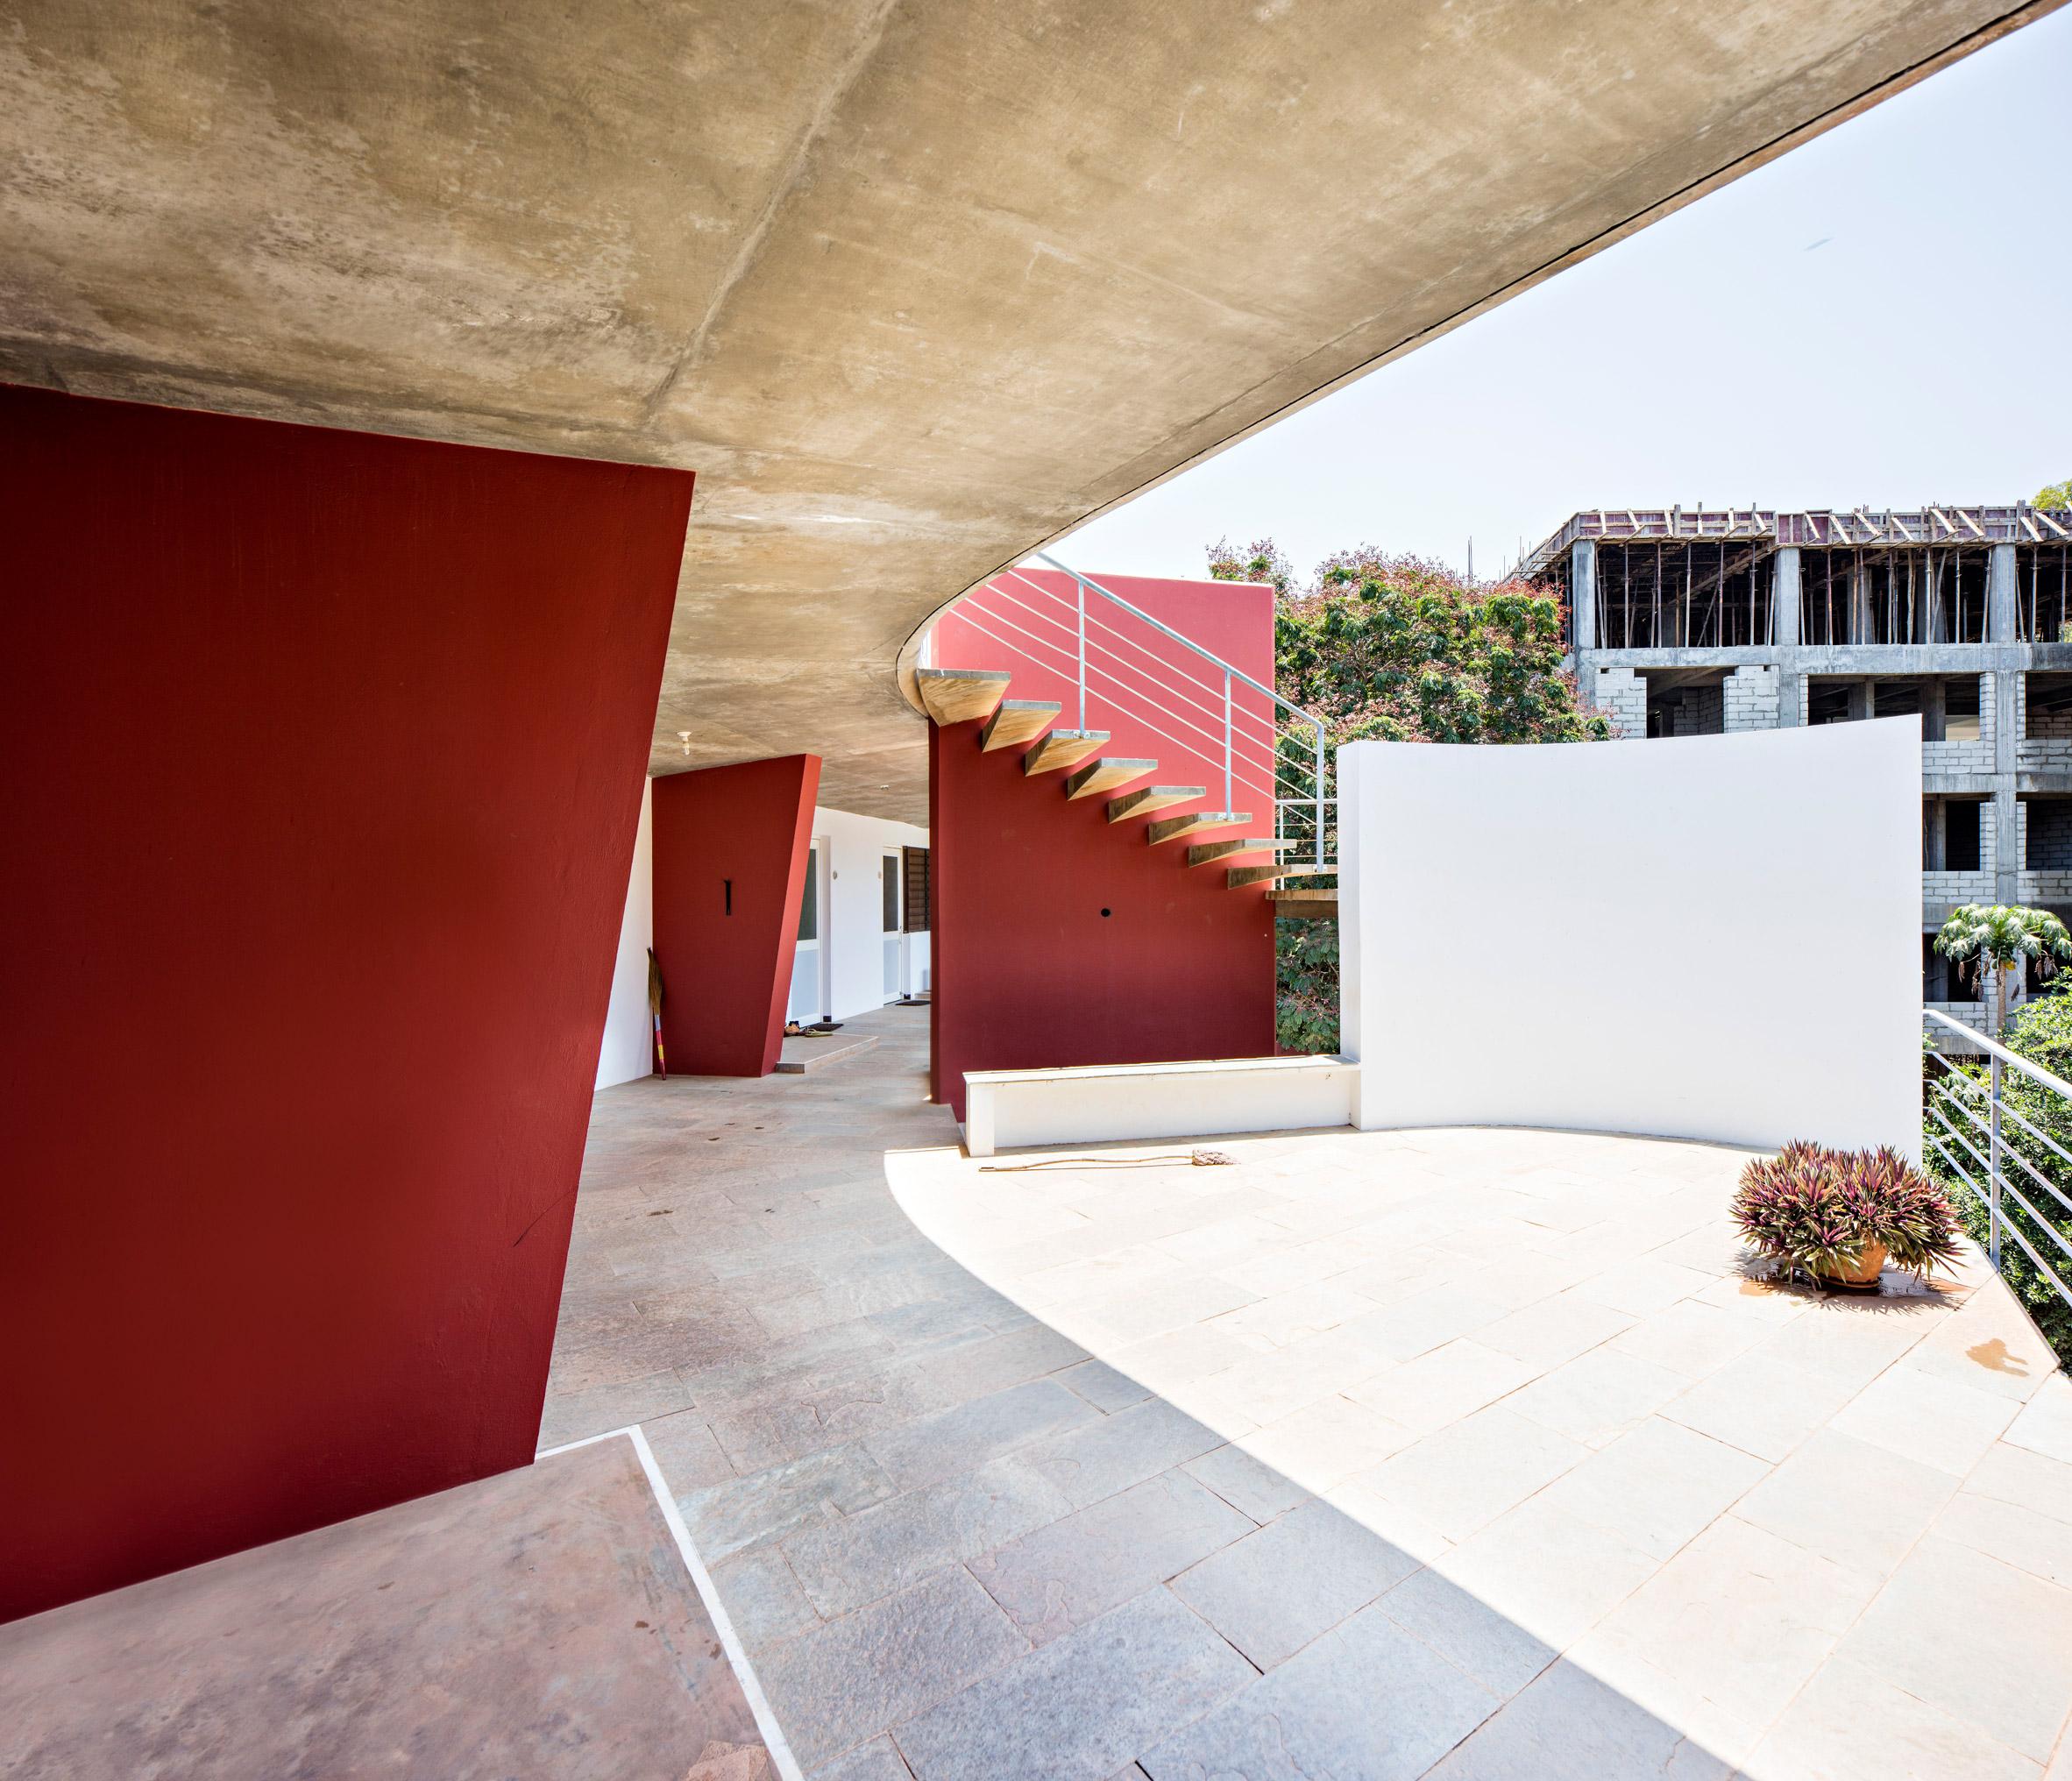 Anupama Kundoo architecture: Mitra Youth Hostel, 2005